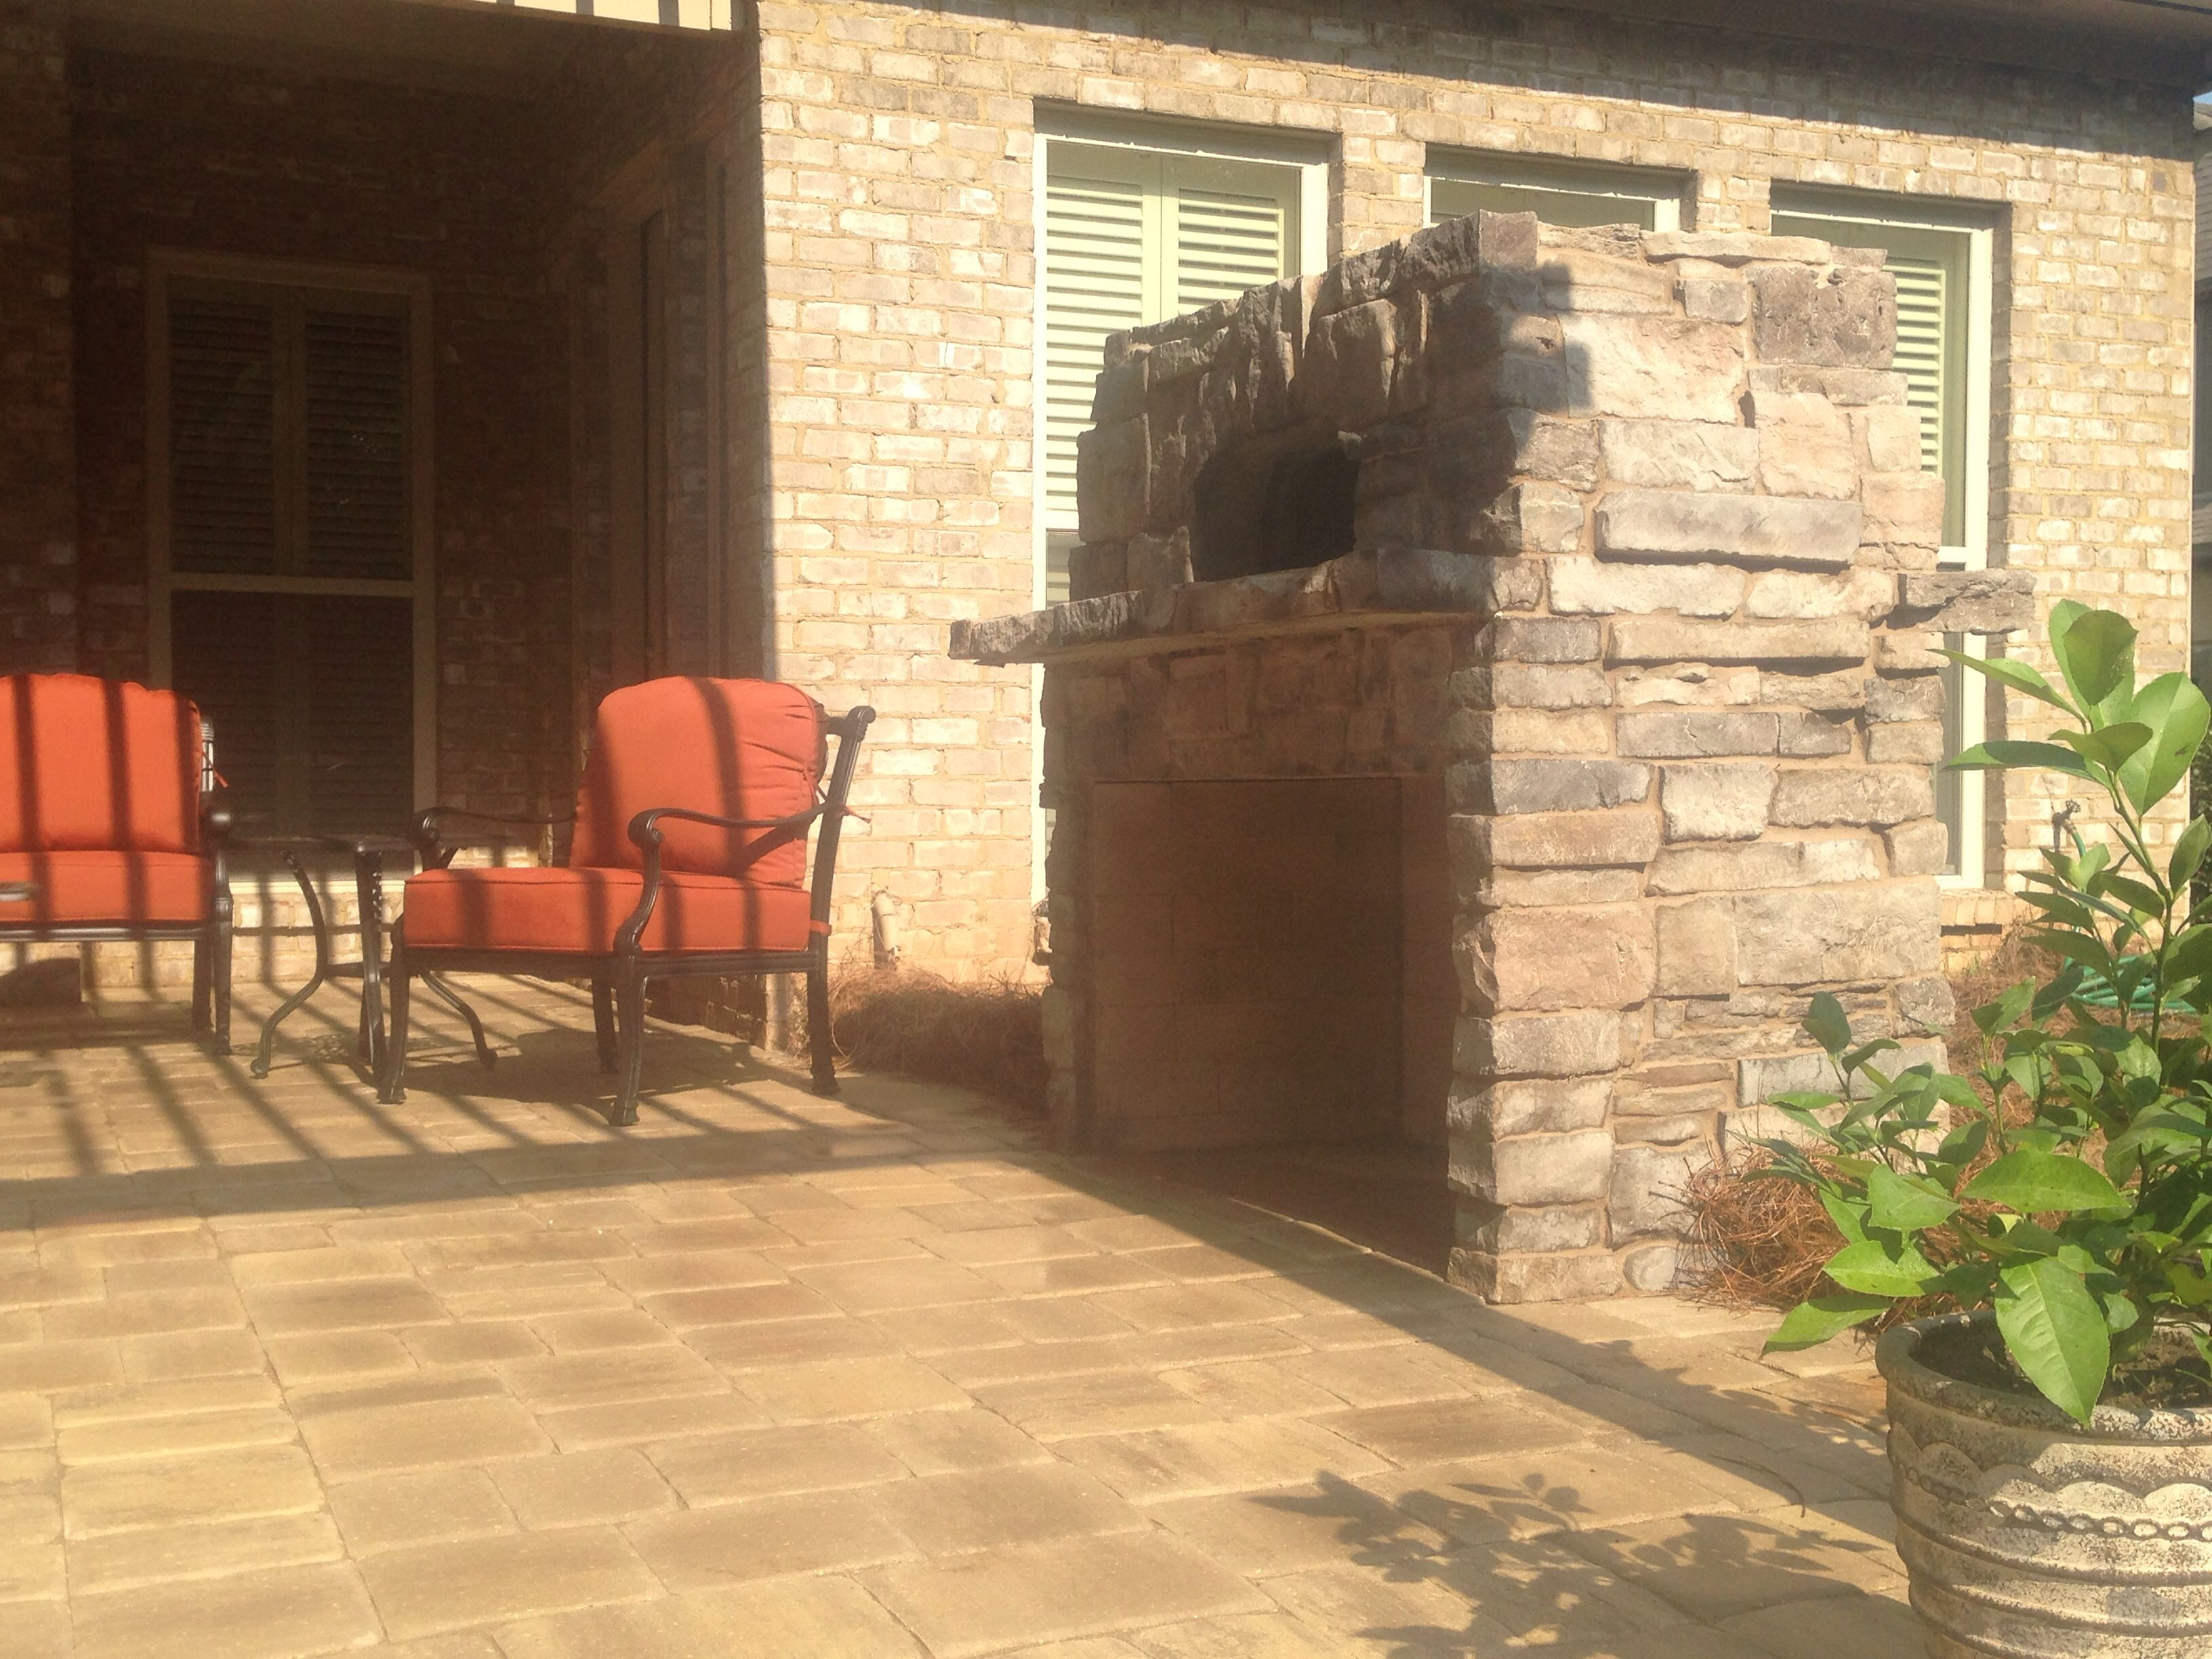 Stone Pizza Kitchen over Fireplace  Southern Hardscapes   www.southernhardscapesal.com